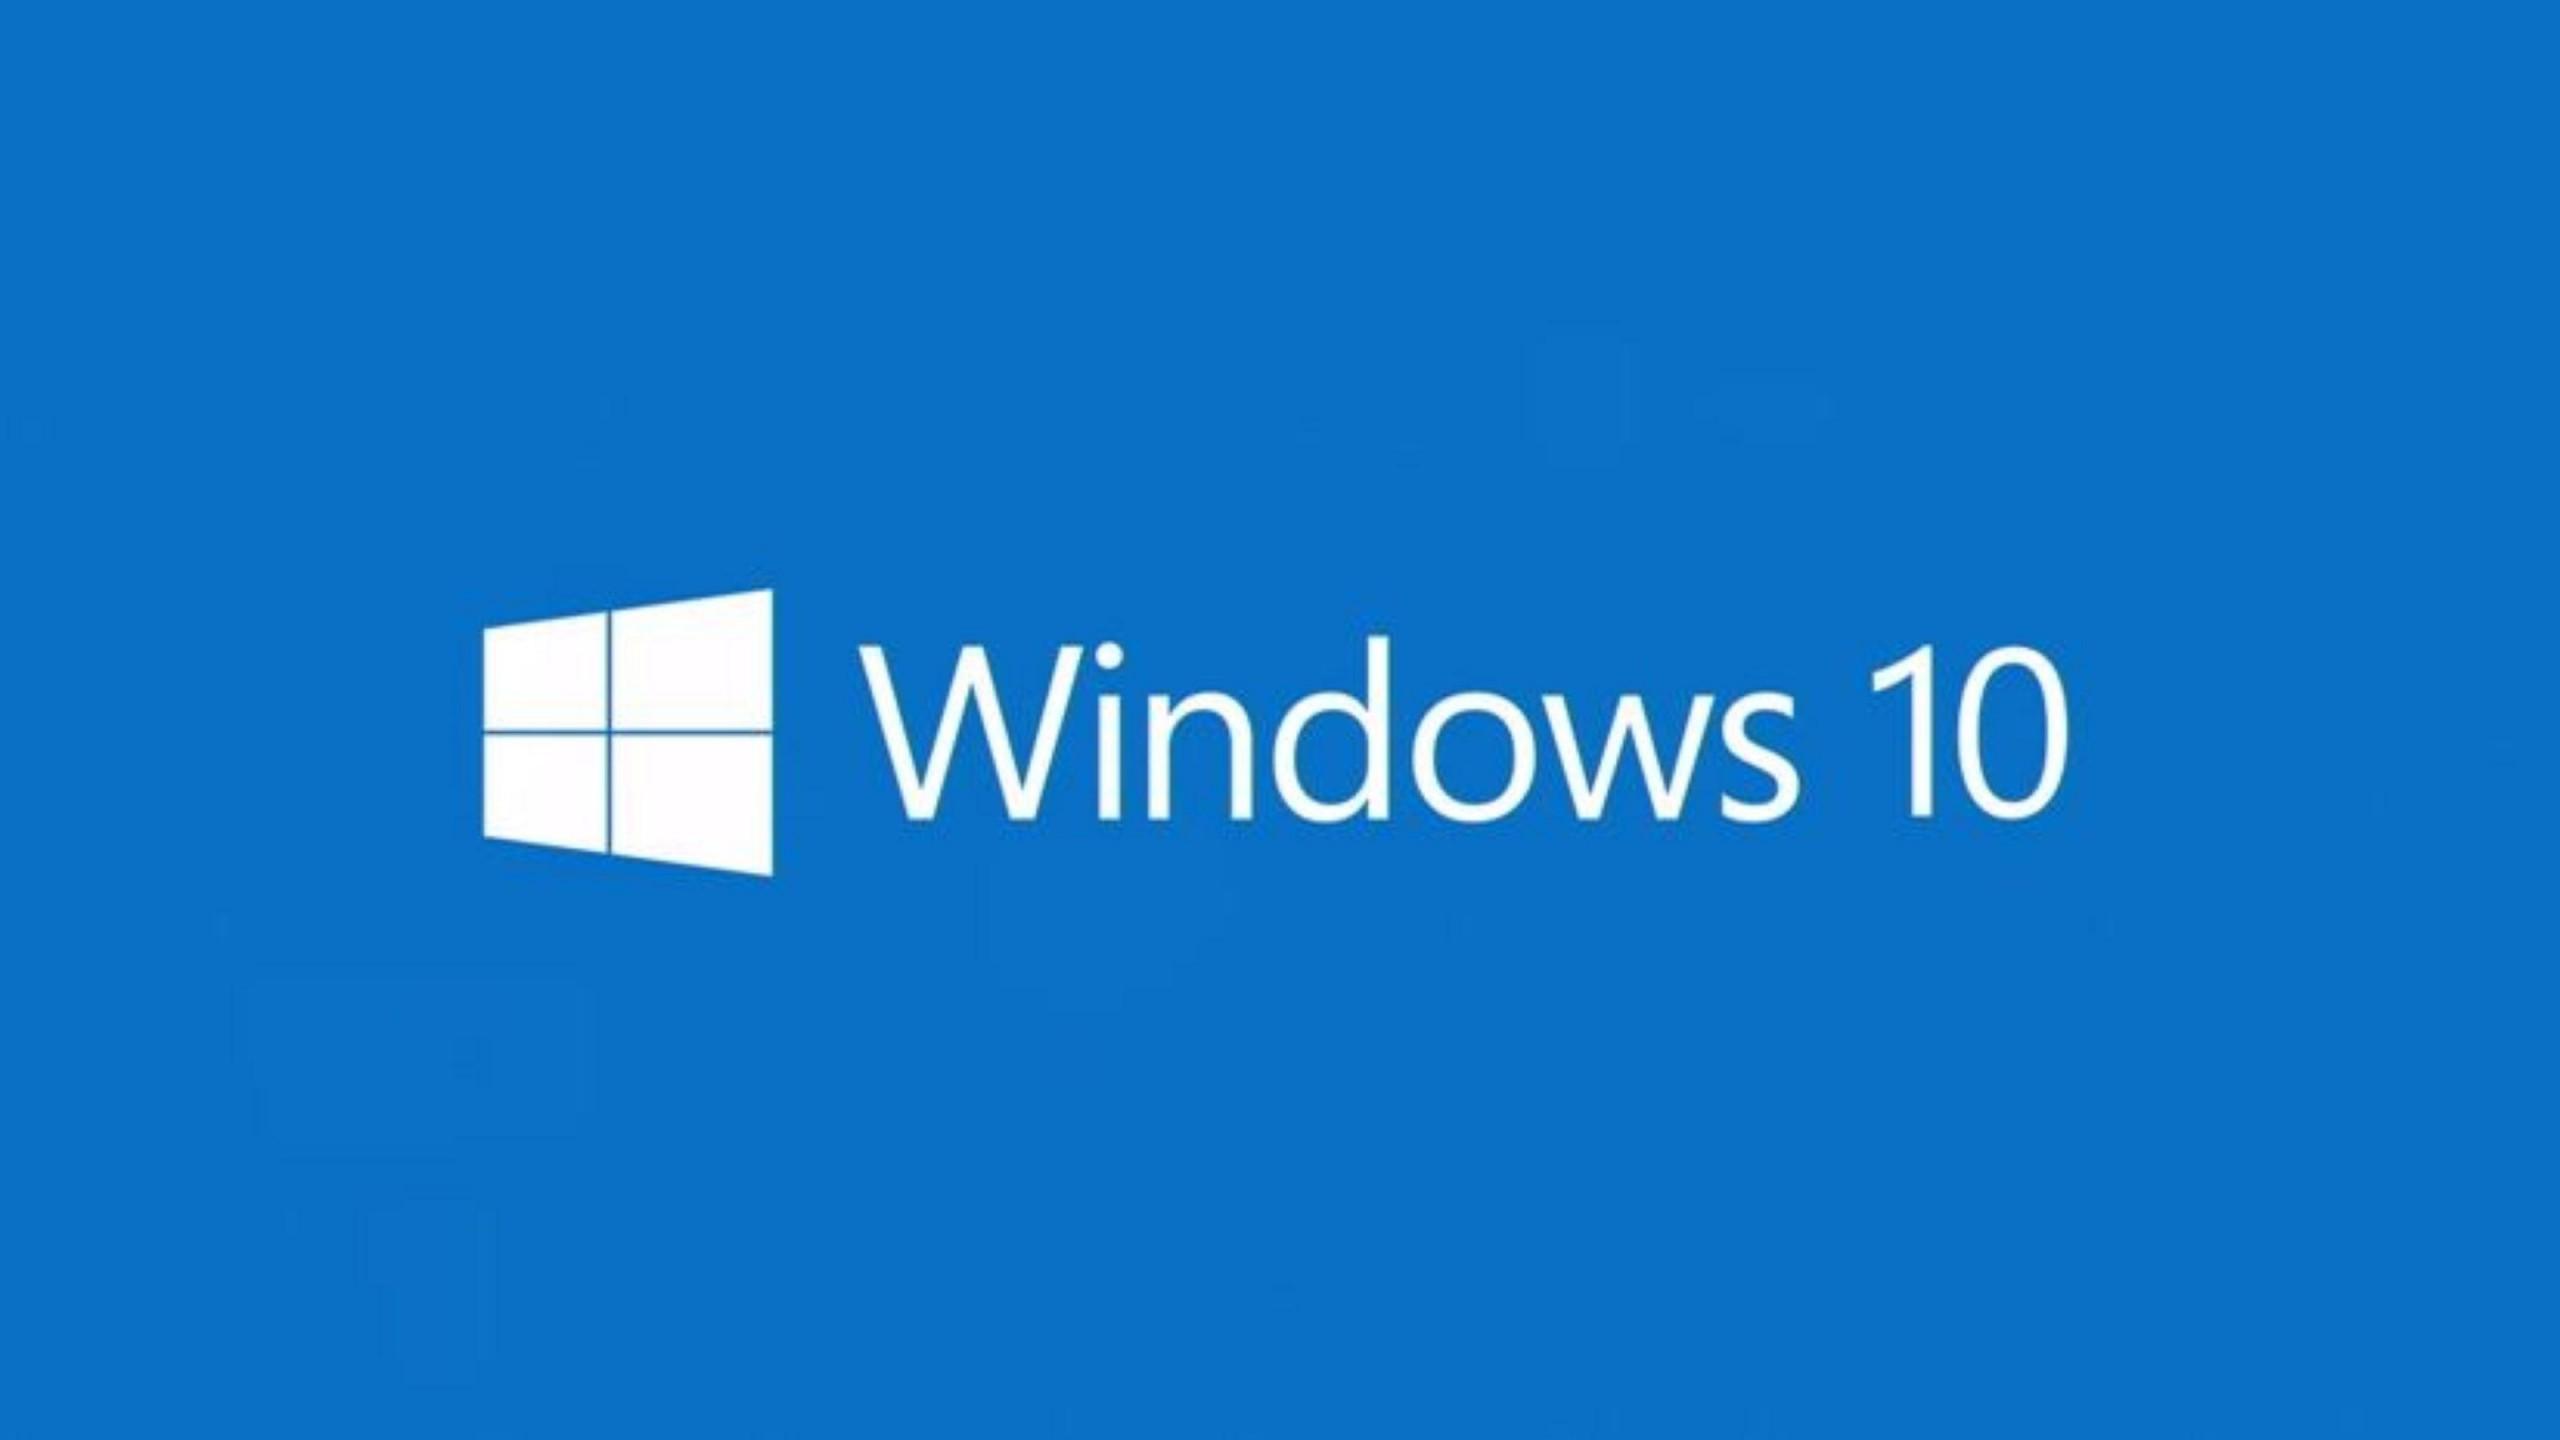 Microsoft HD 2560x1440